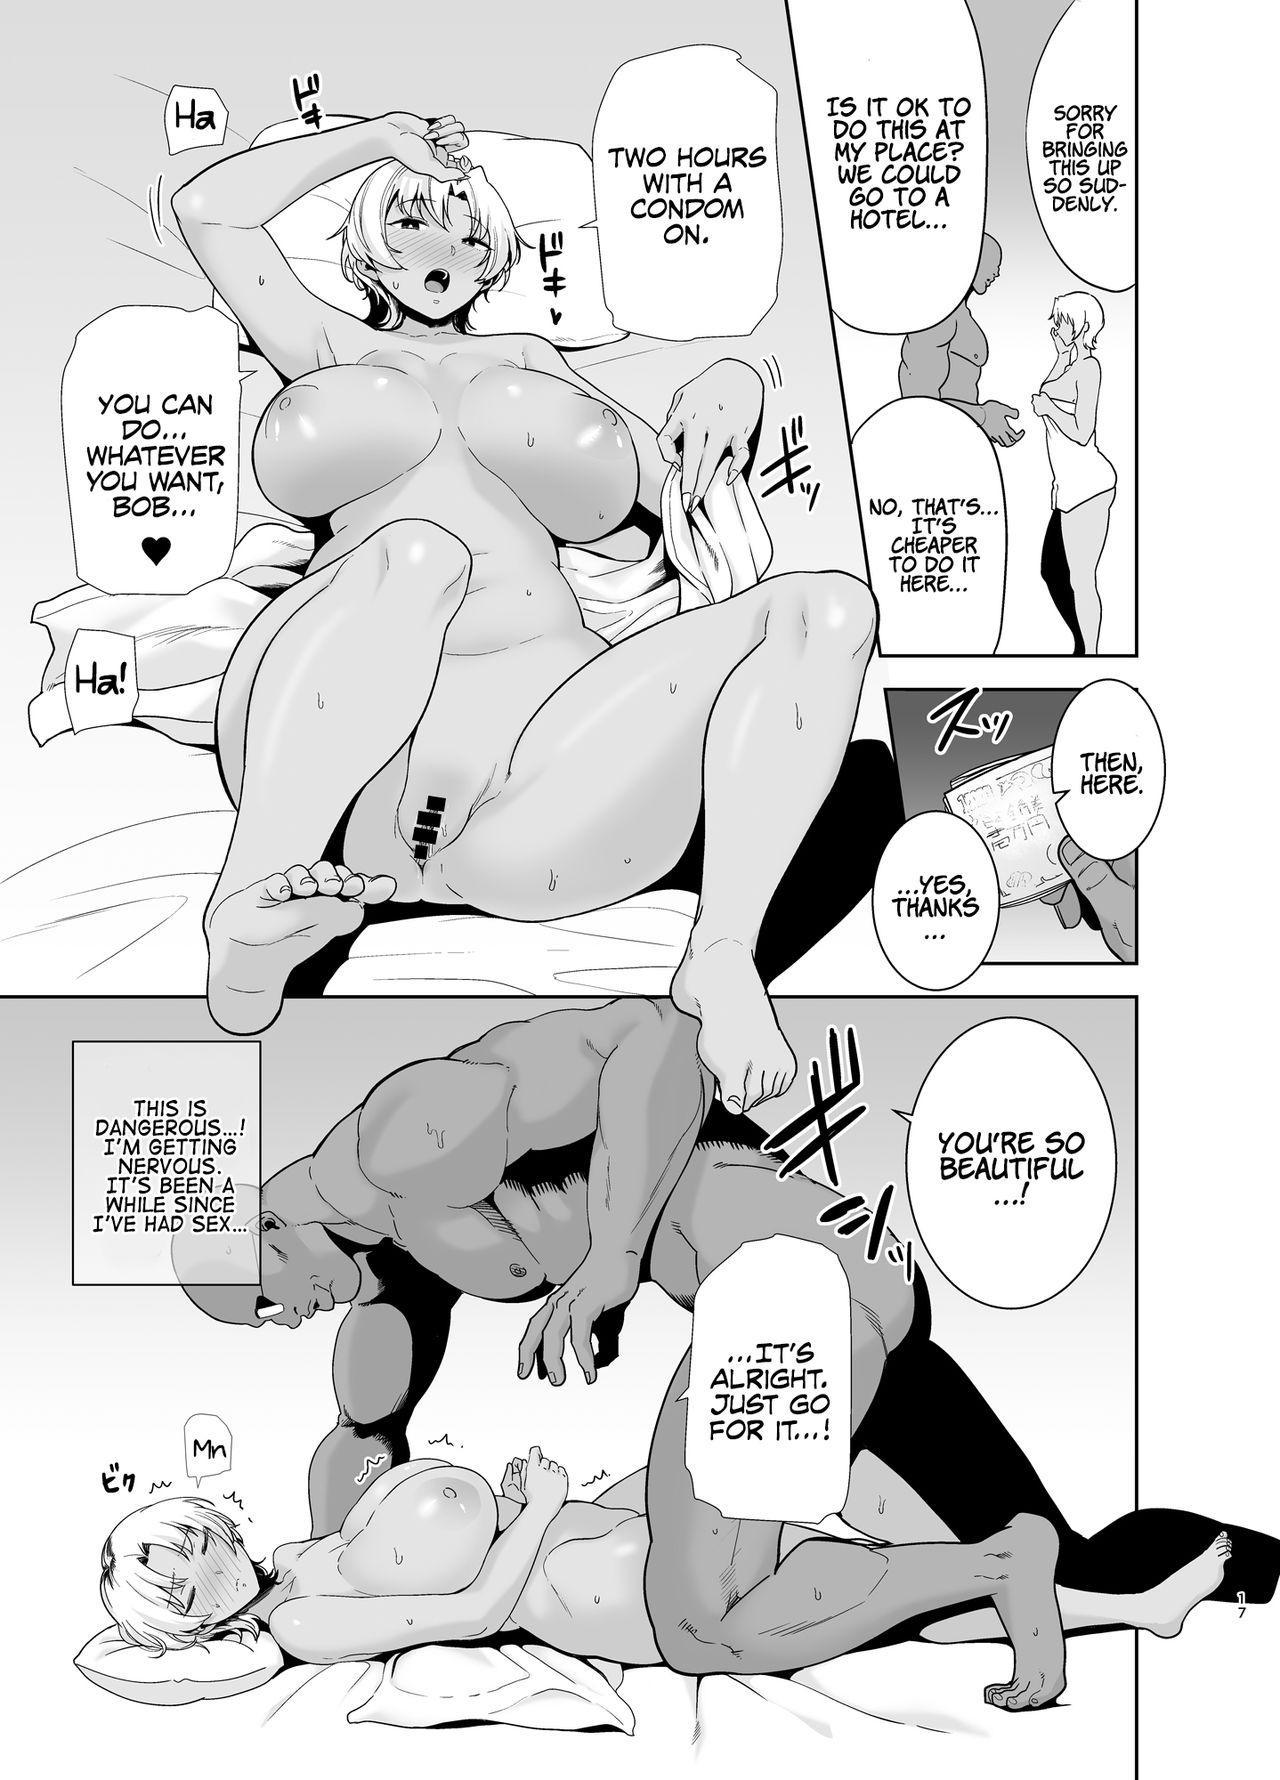 [DOLL PLAY (Kurosu Gatari)] Wild-shiki Nihonjin Tsuma no Netorikata Sono Ni | Wild Method - How to Steal a Japanese Housewife - Part Two [English] [Coffedrug] [Digital] 15